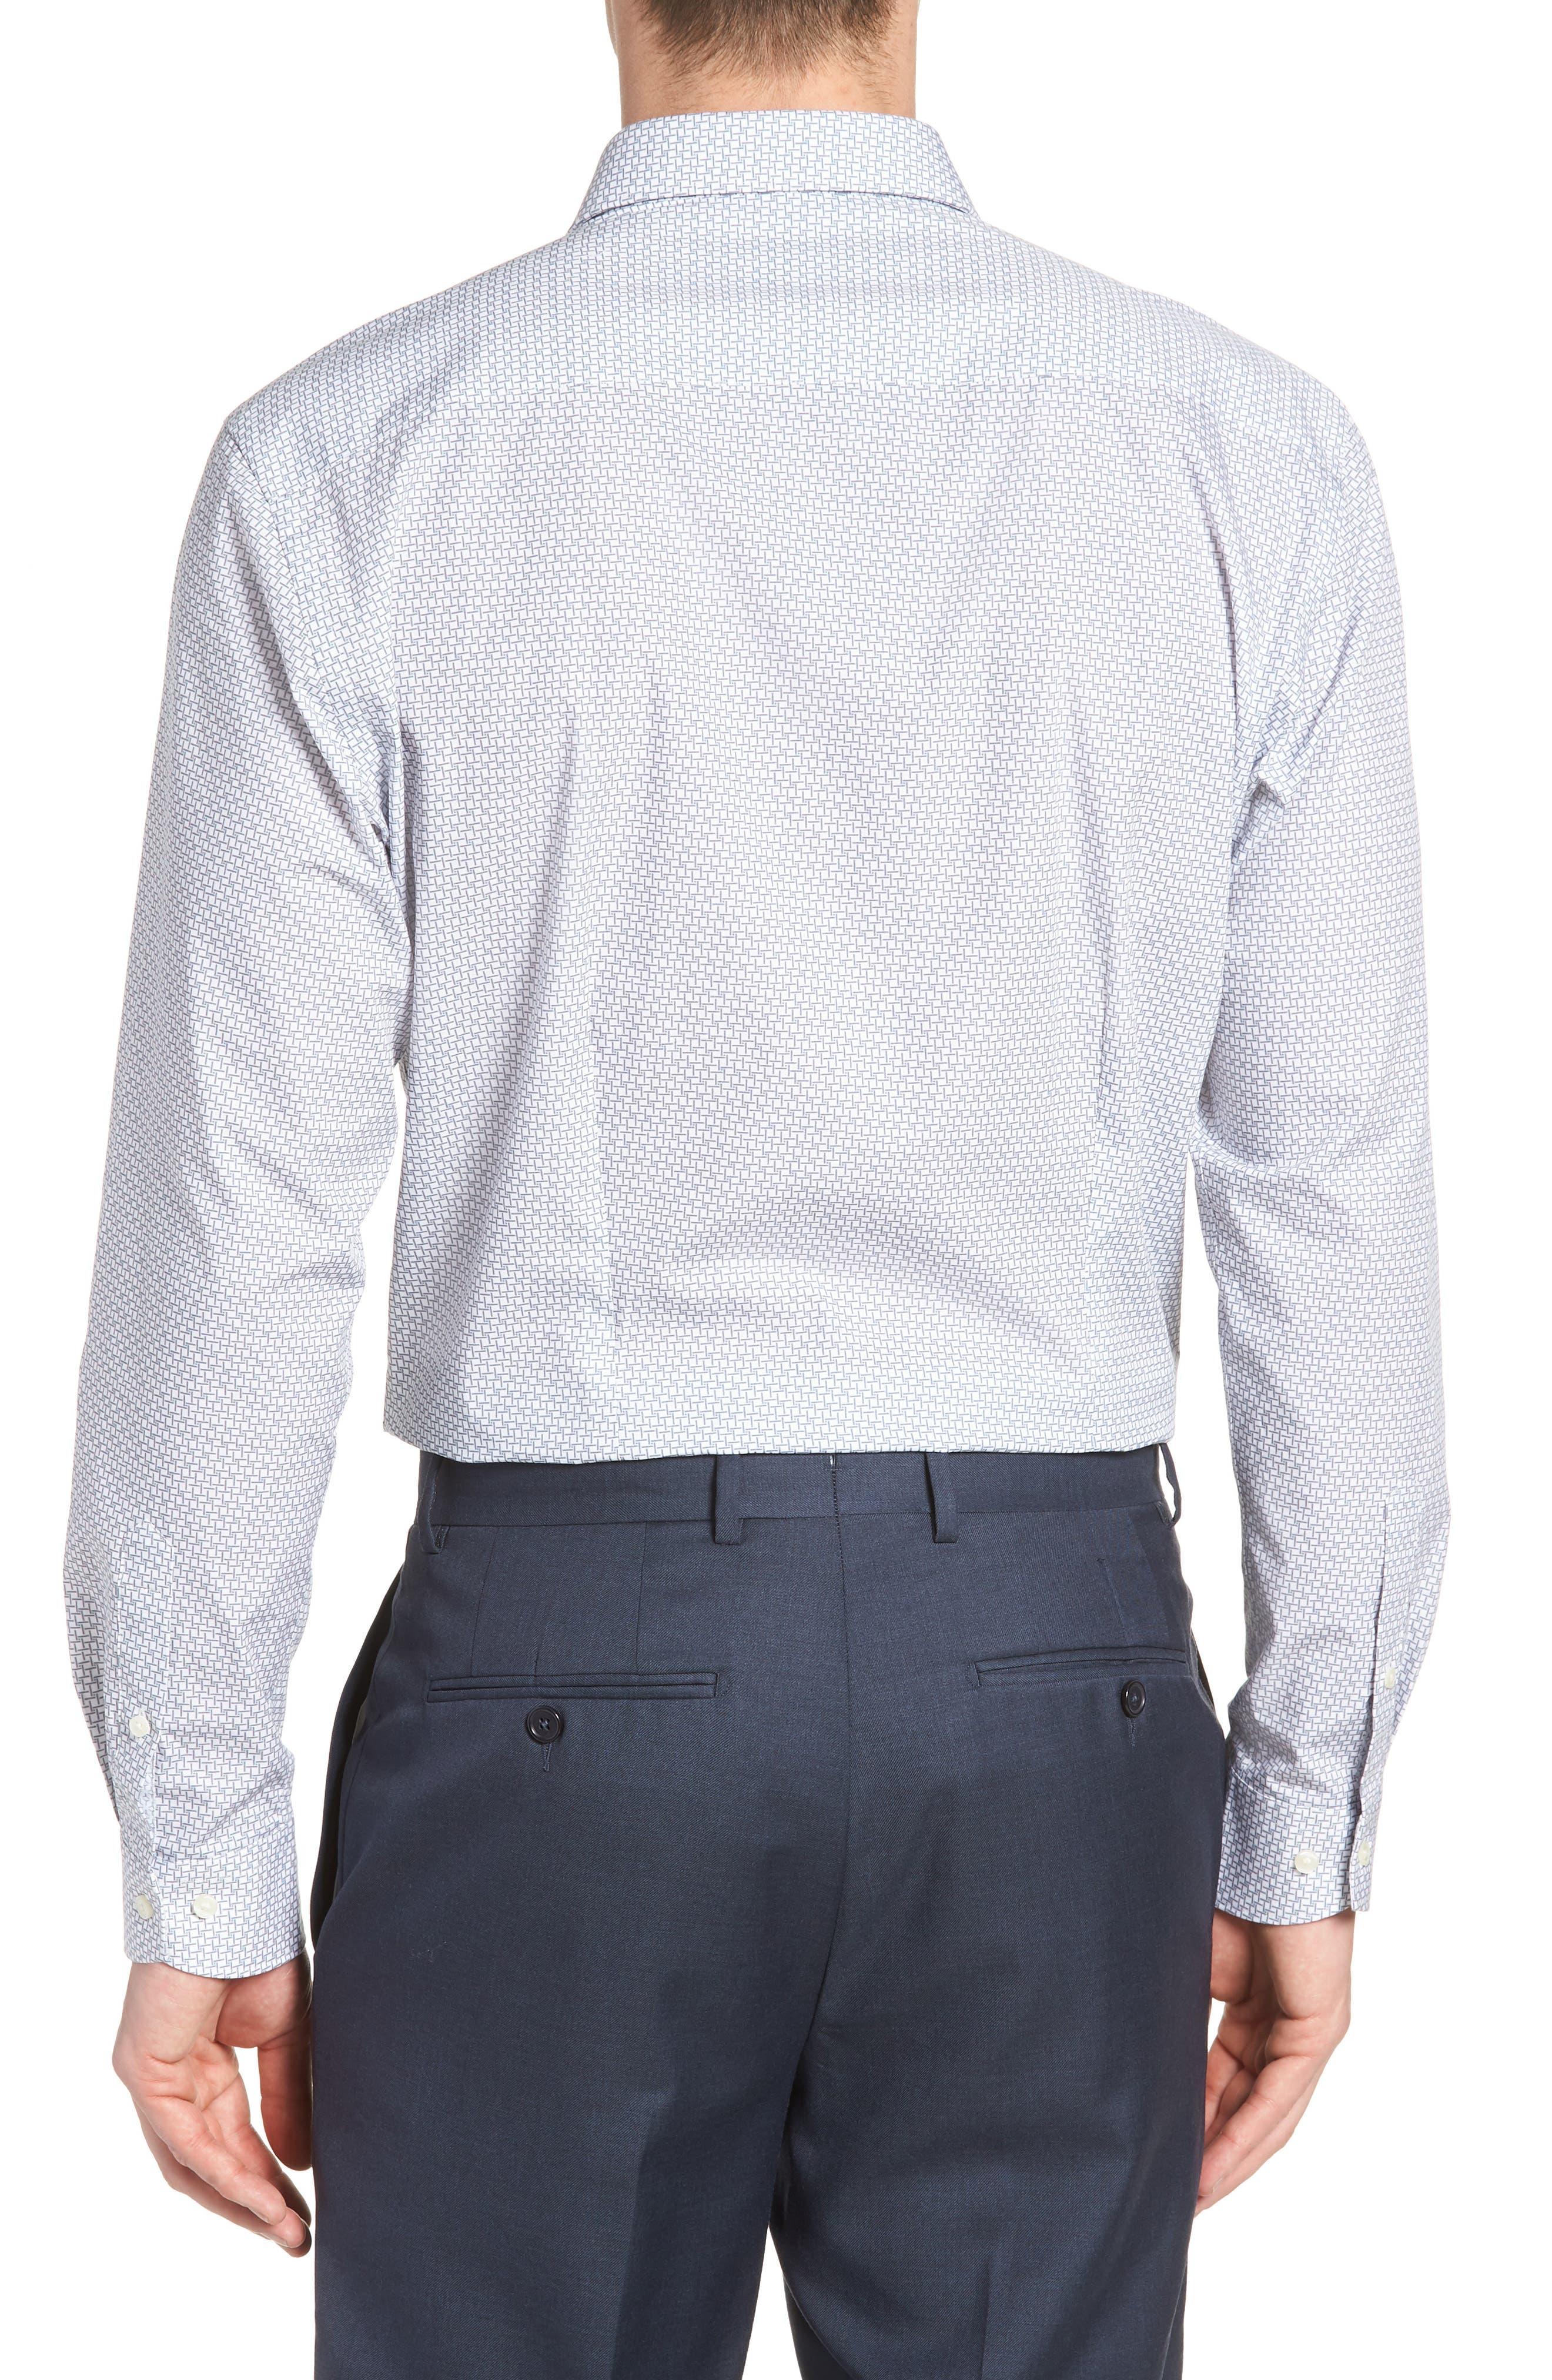 Rosprim Trim Fit Geometric Dress Shirt,                             Alternate thumbnail 3, color,                             GREY